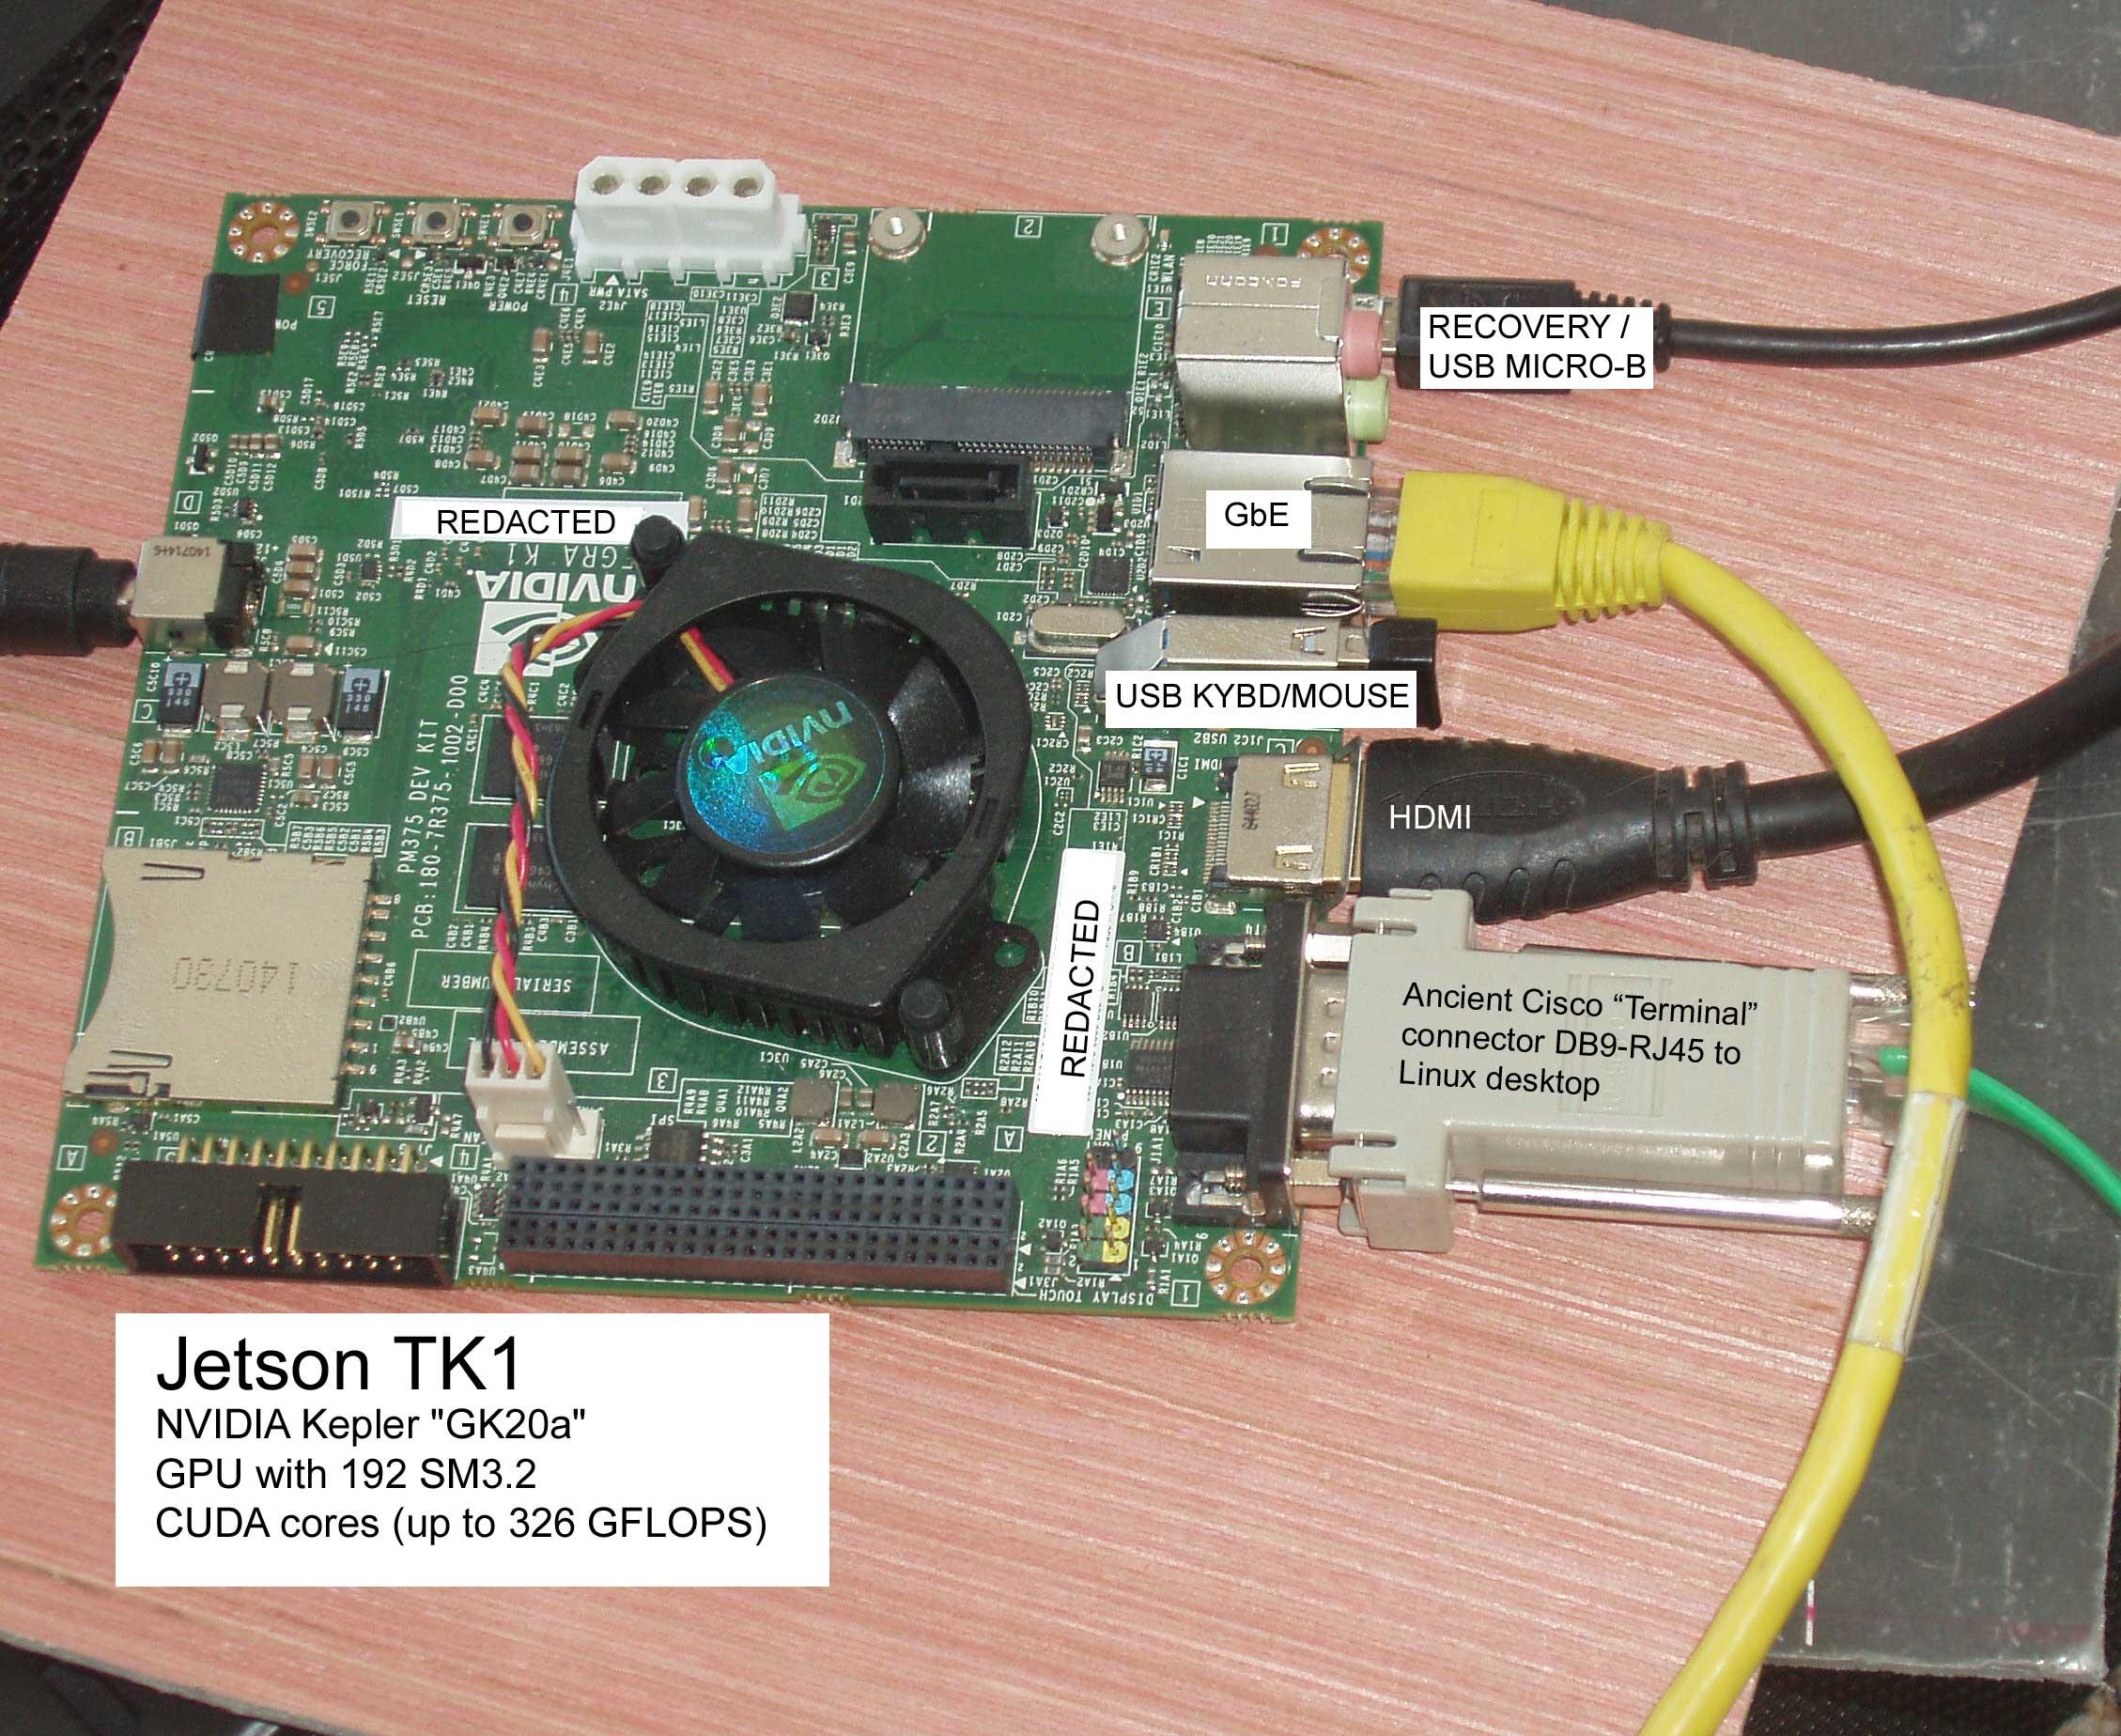 Jetson TK1 - Terminus